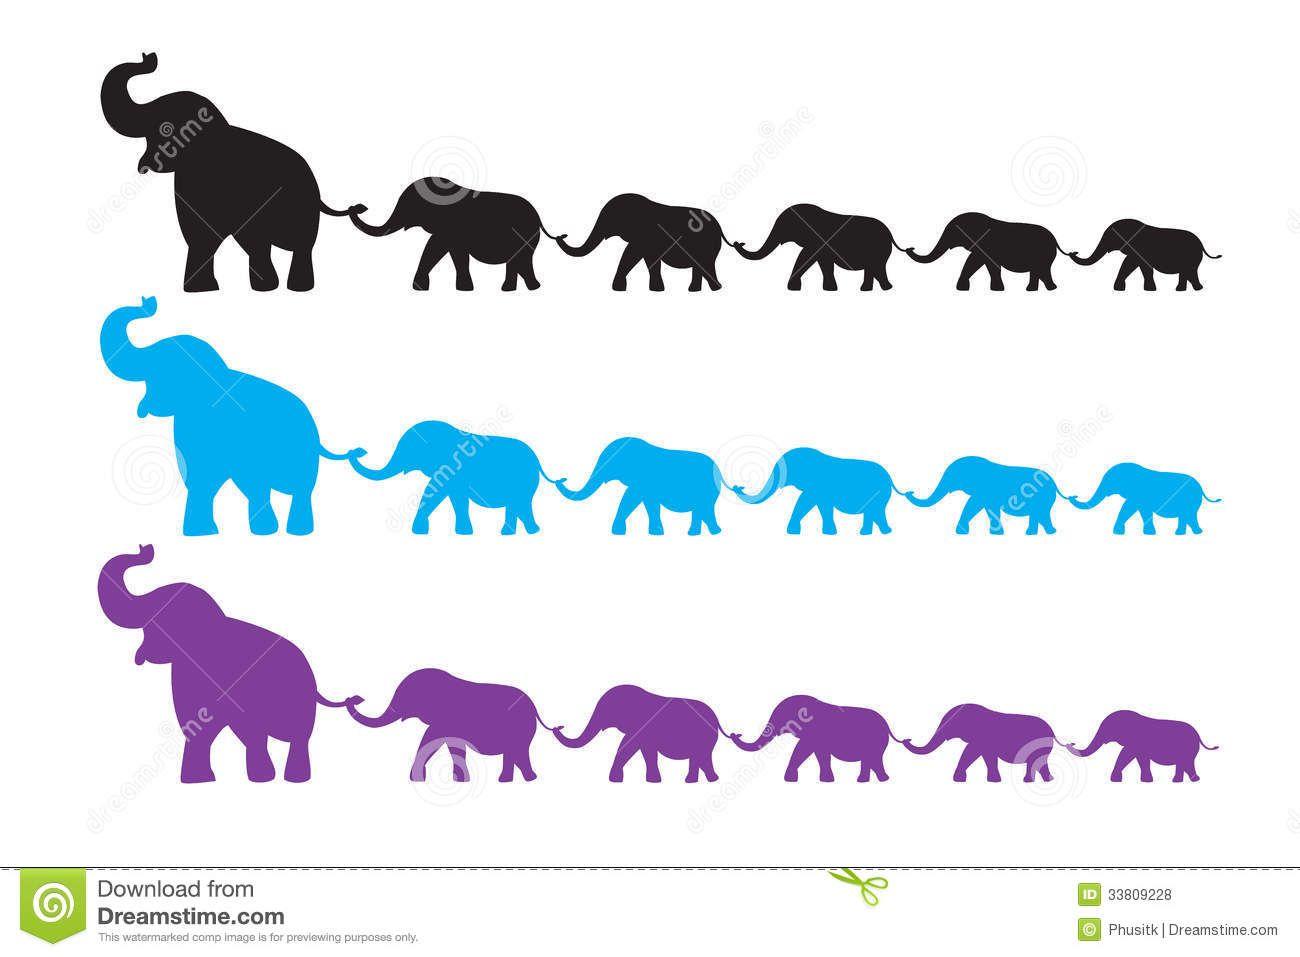 Tattoo elephants walking silhouette. Chain clipart elephant